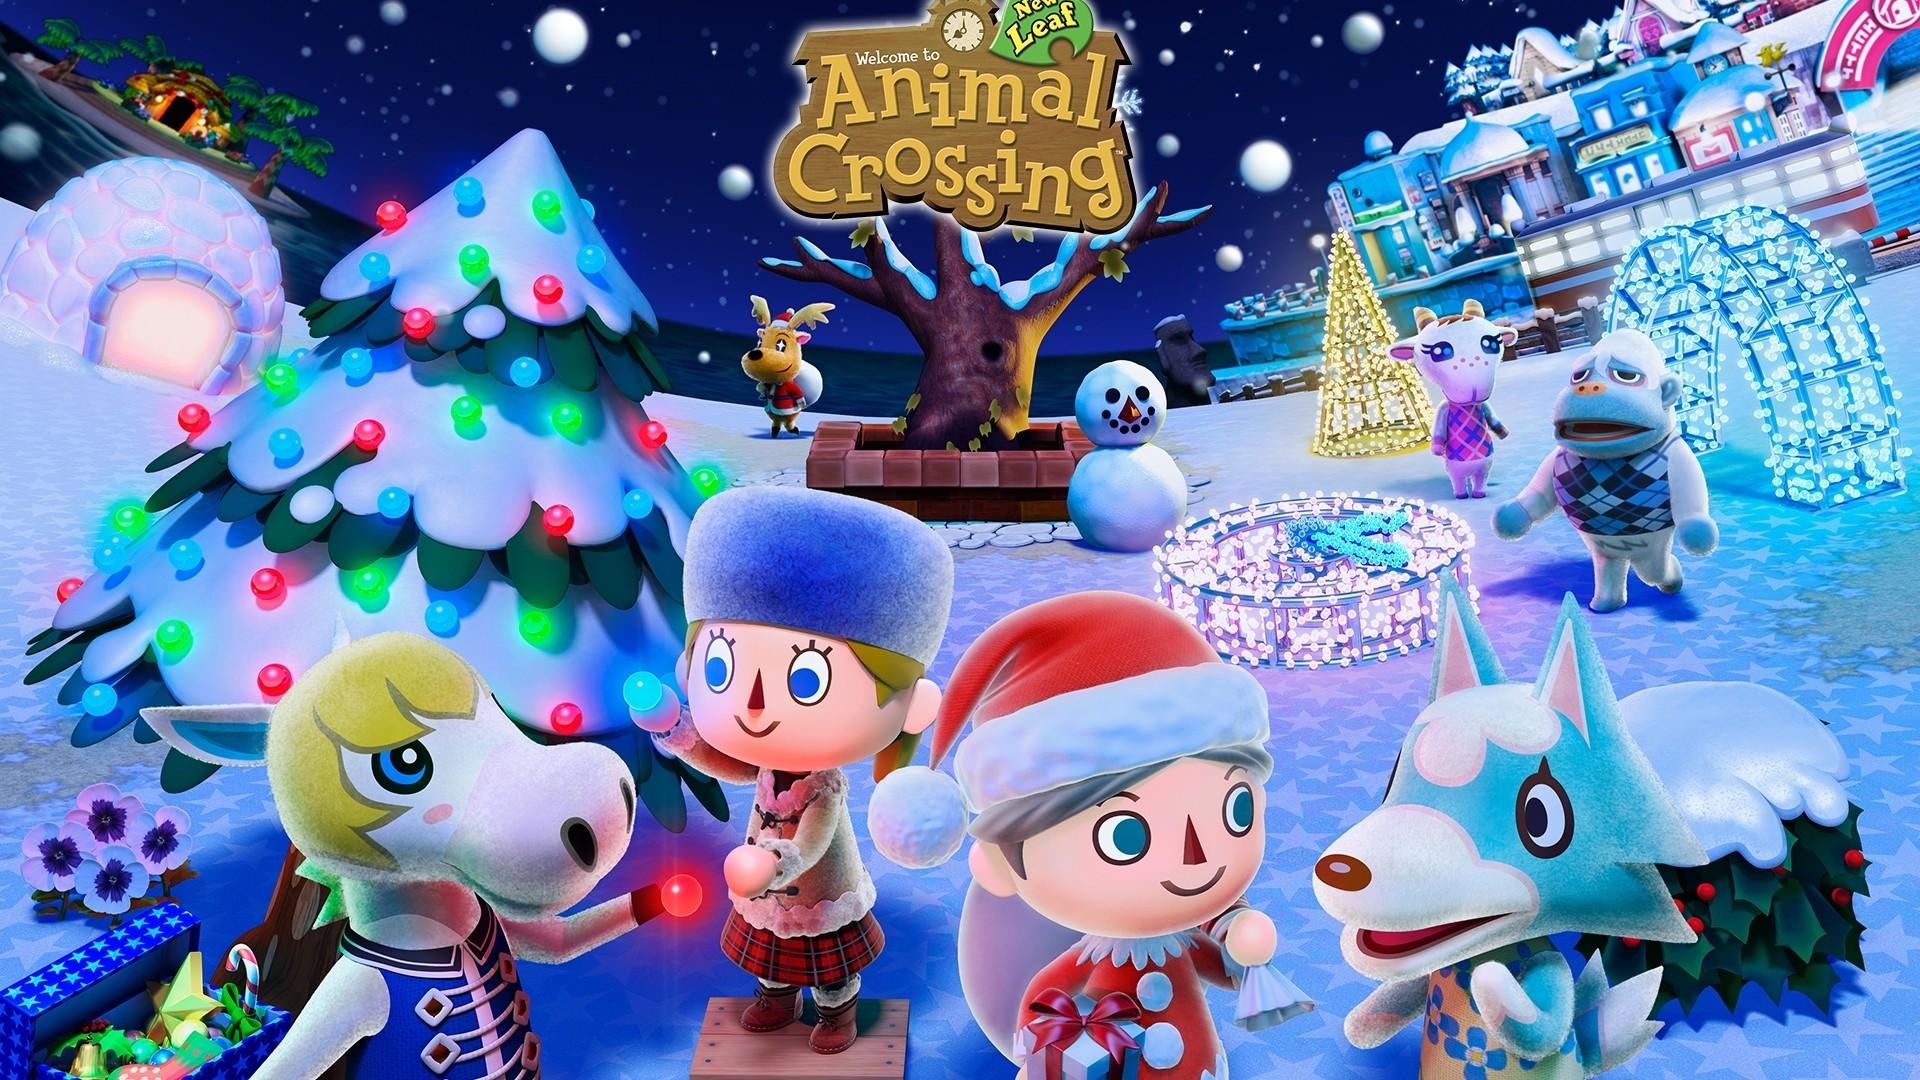 Animal Crossing PC Wallpaper HD